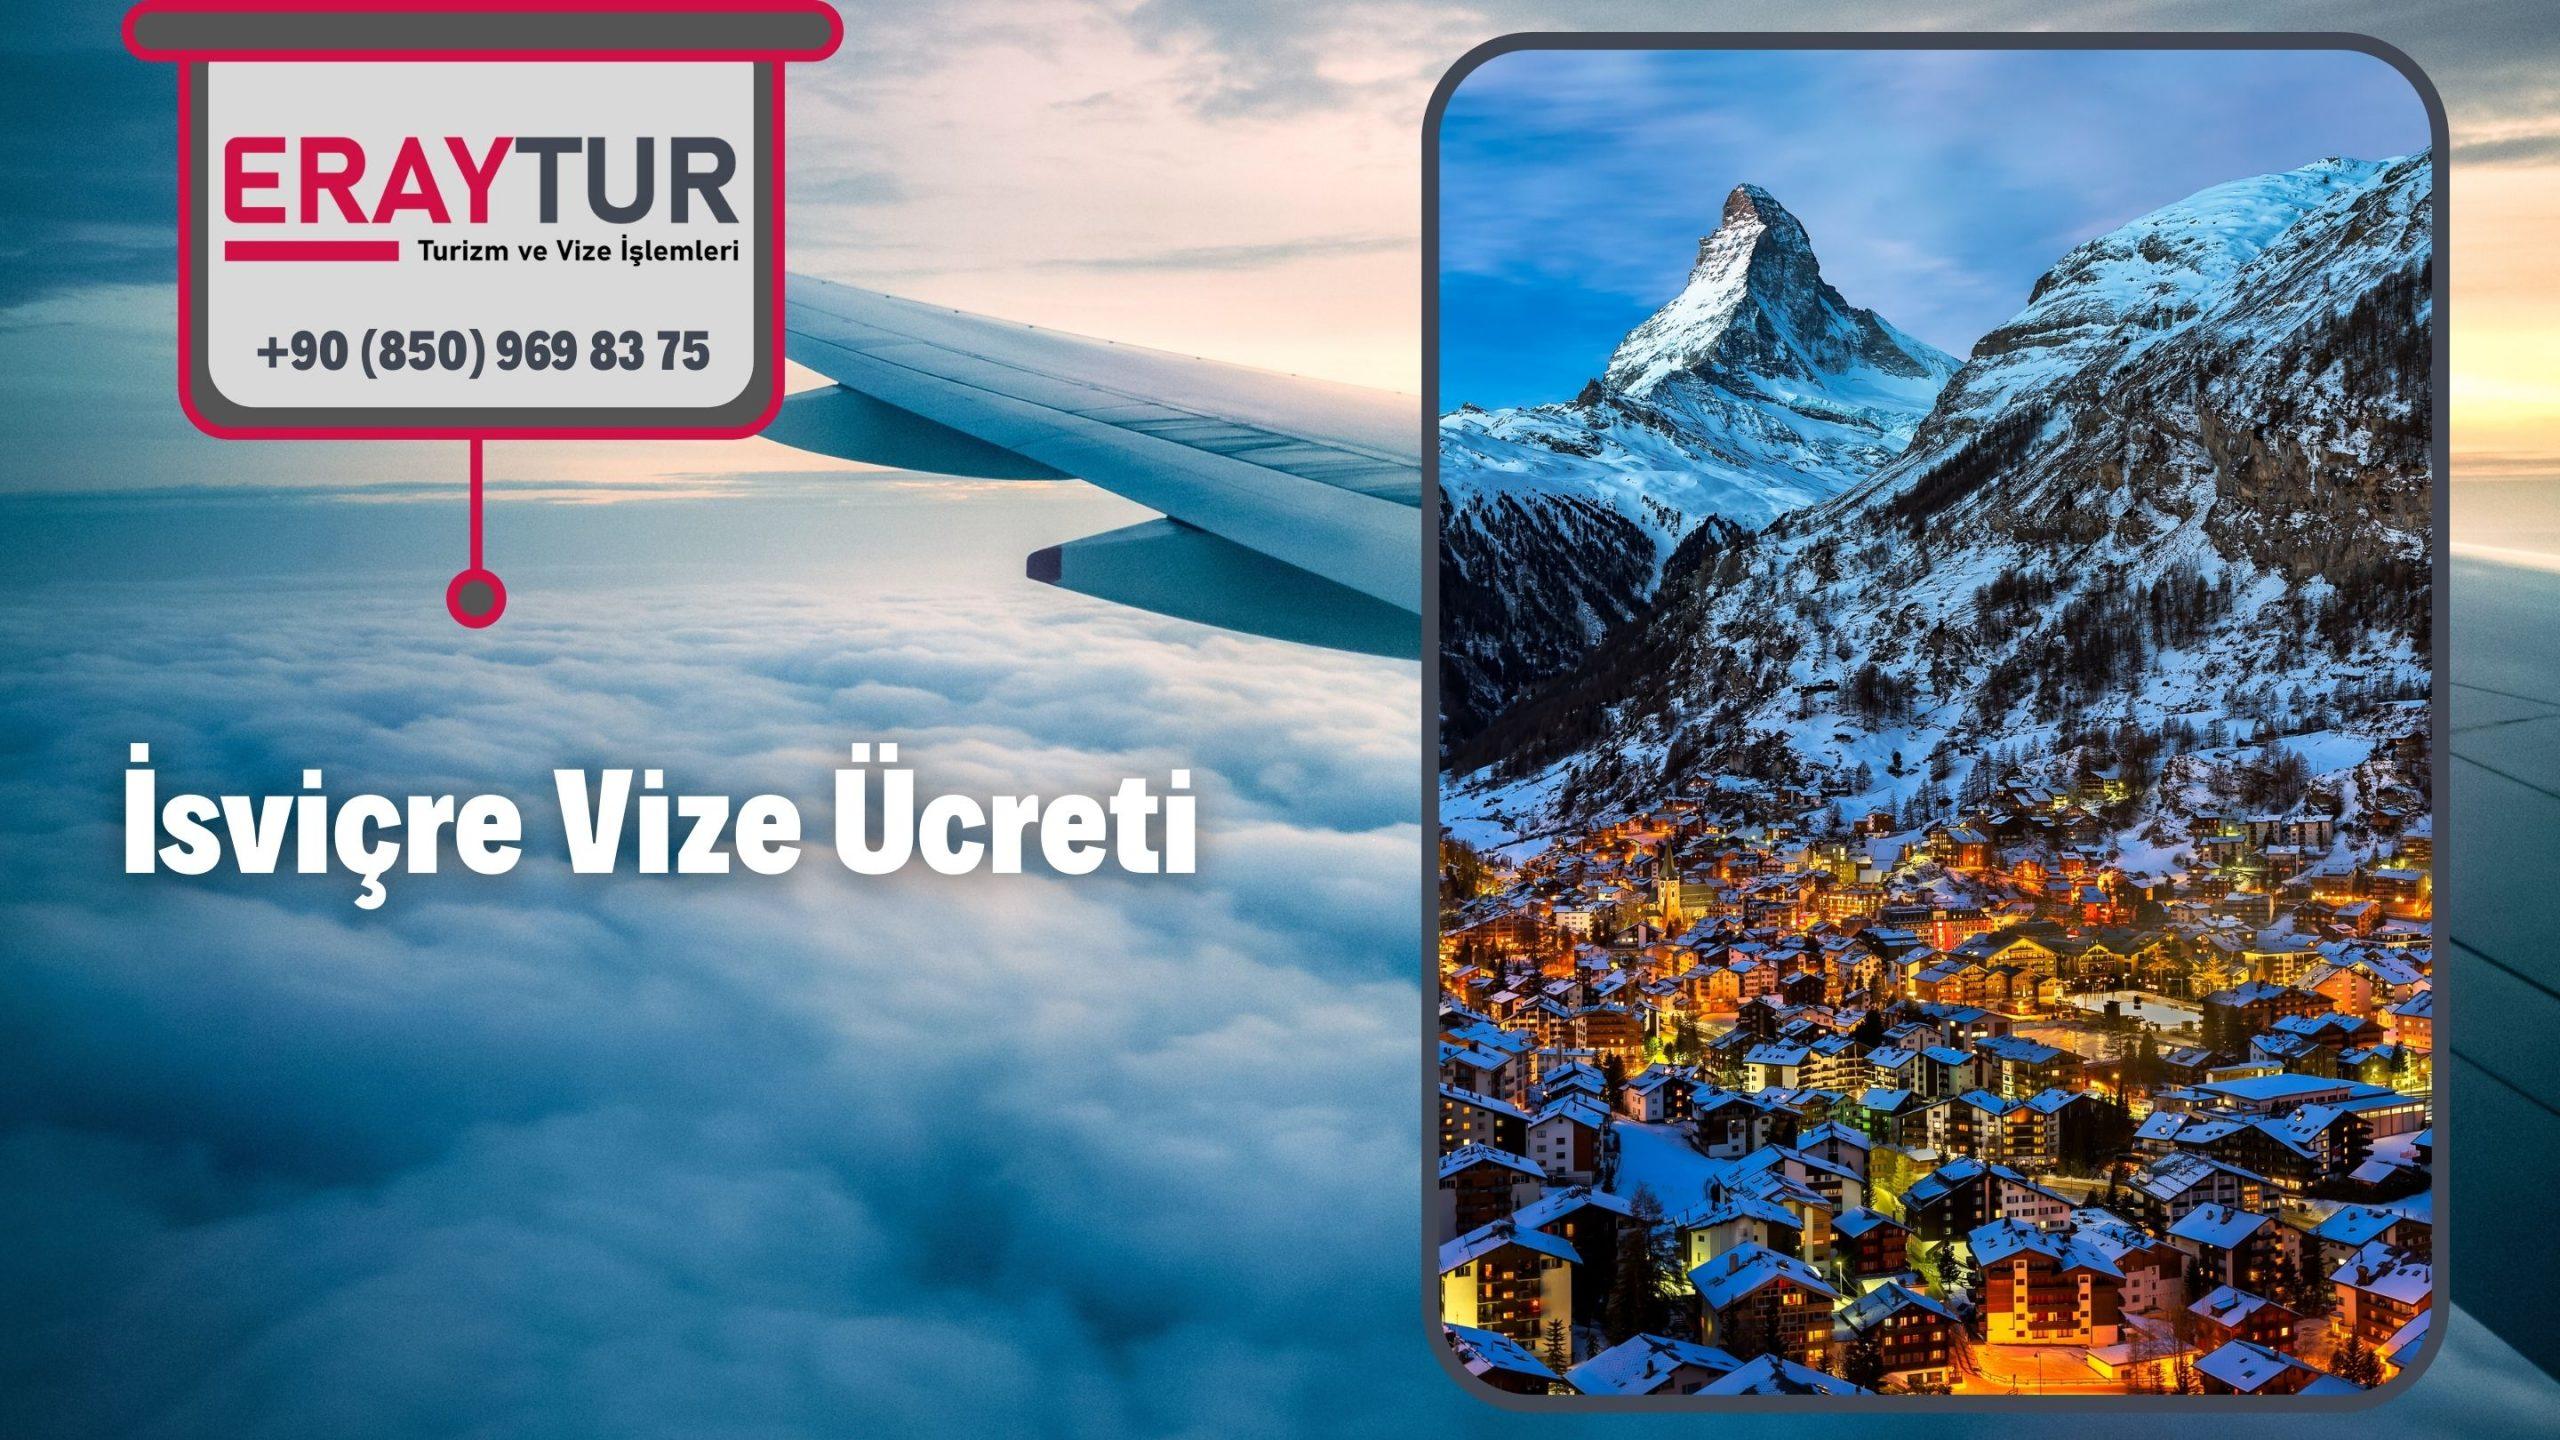 İsviçre Vize Ücreti